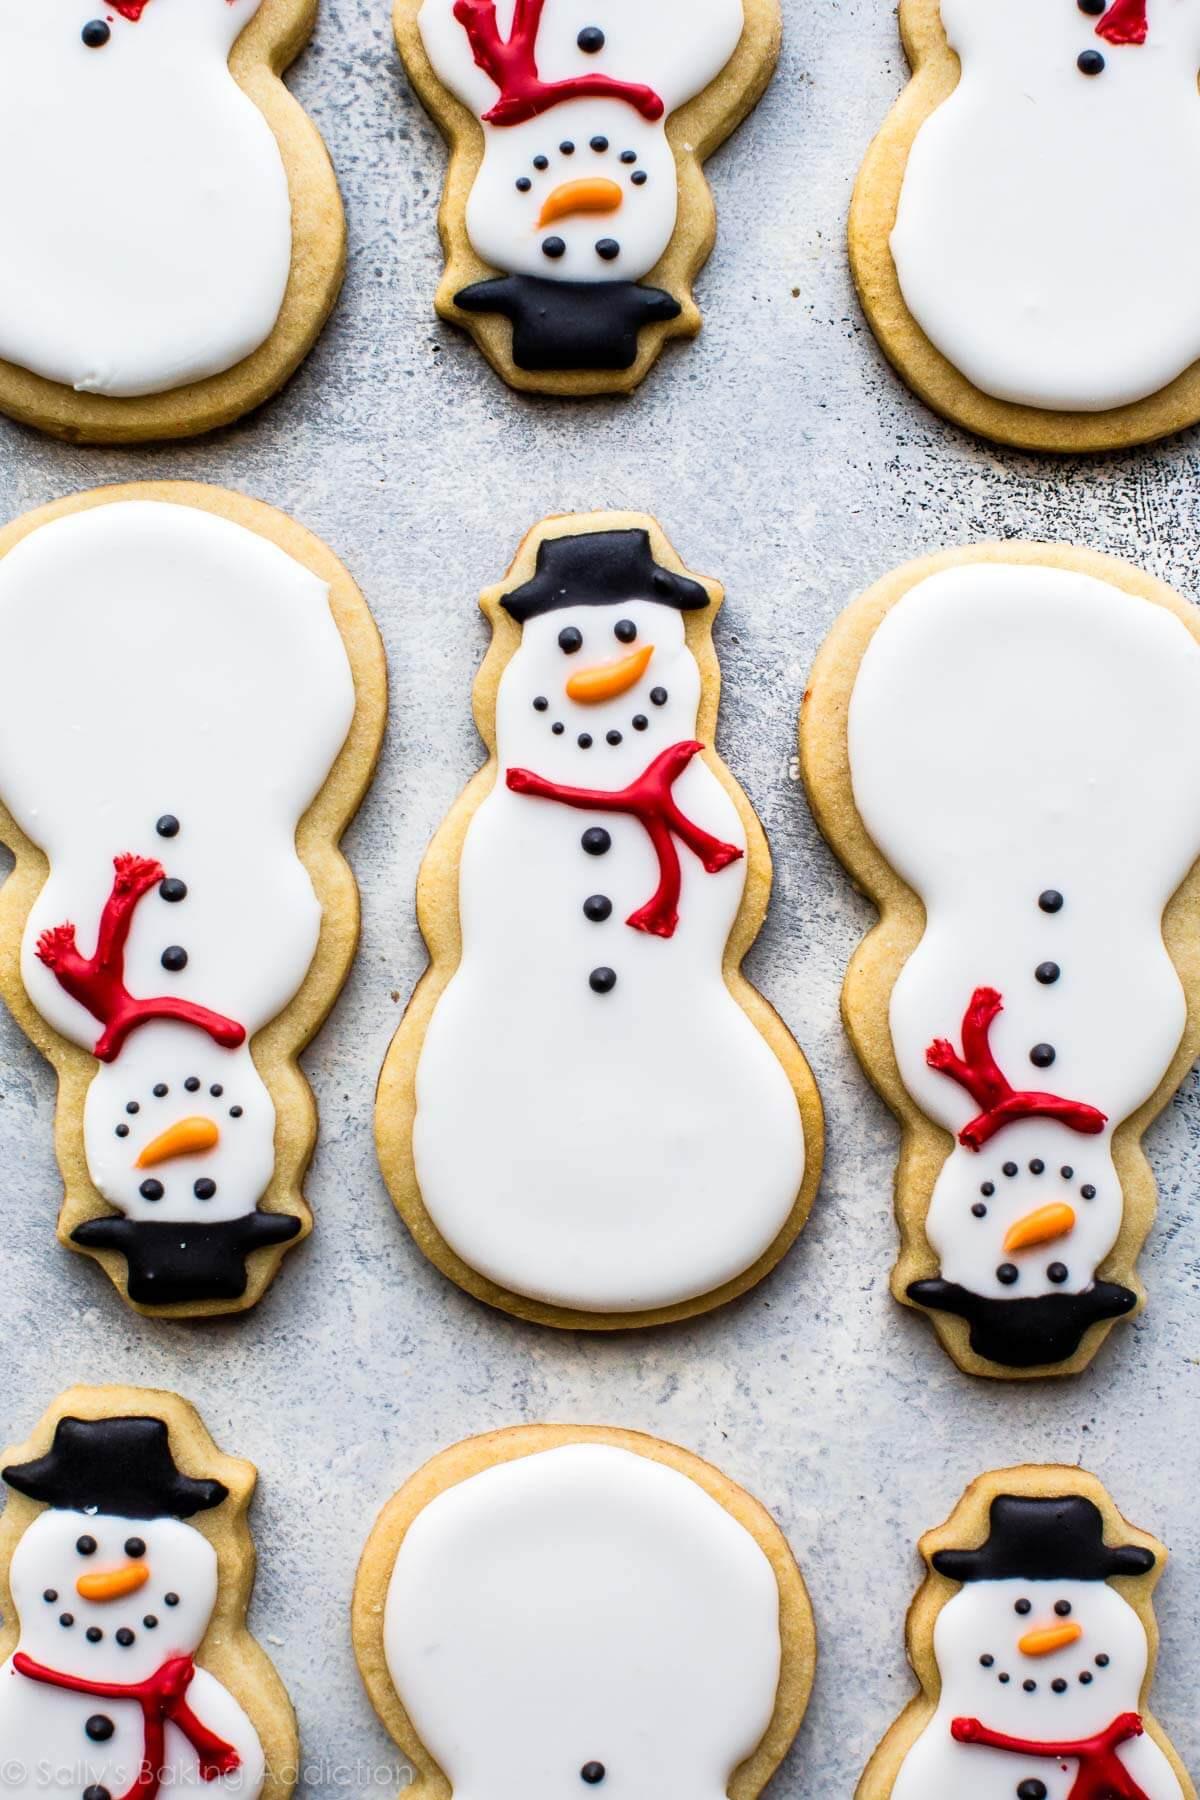 Snowman Christmas Cookies  Snowman Sugar Cookies Sallys Baking Addiction